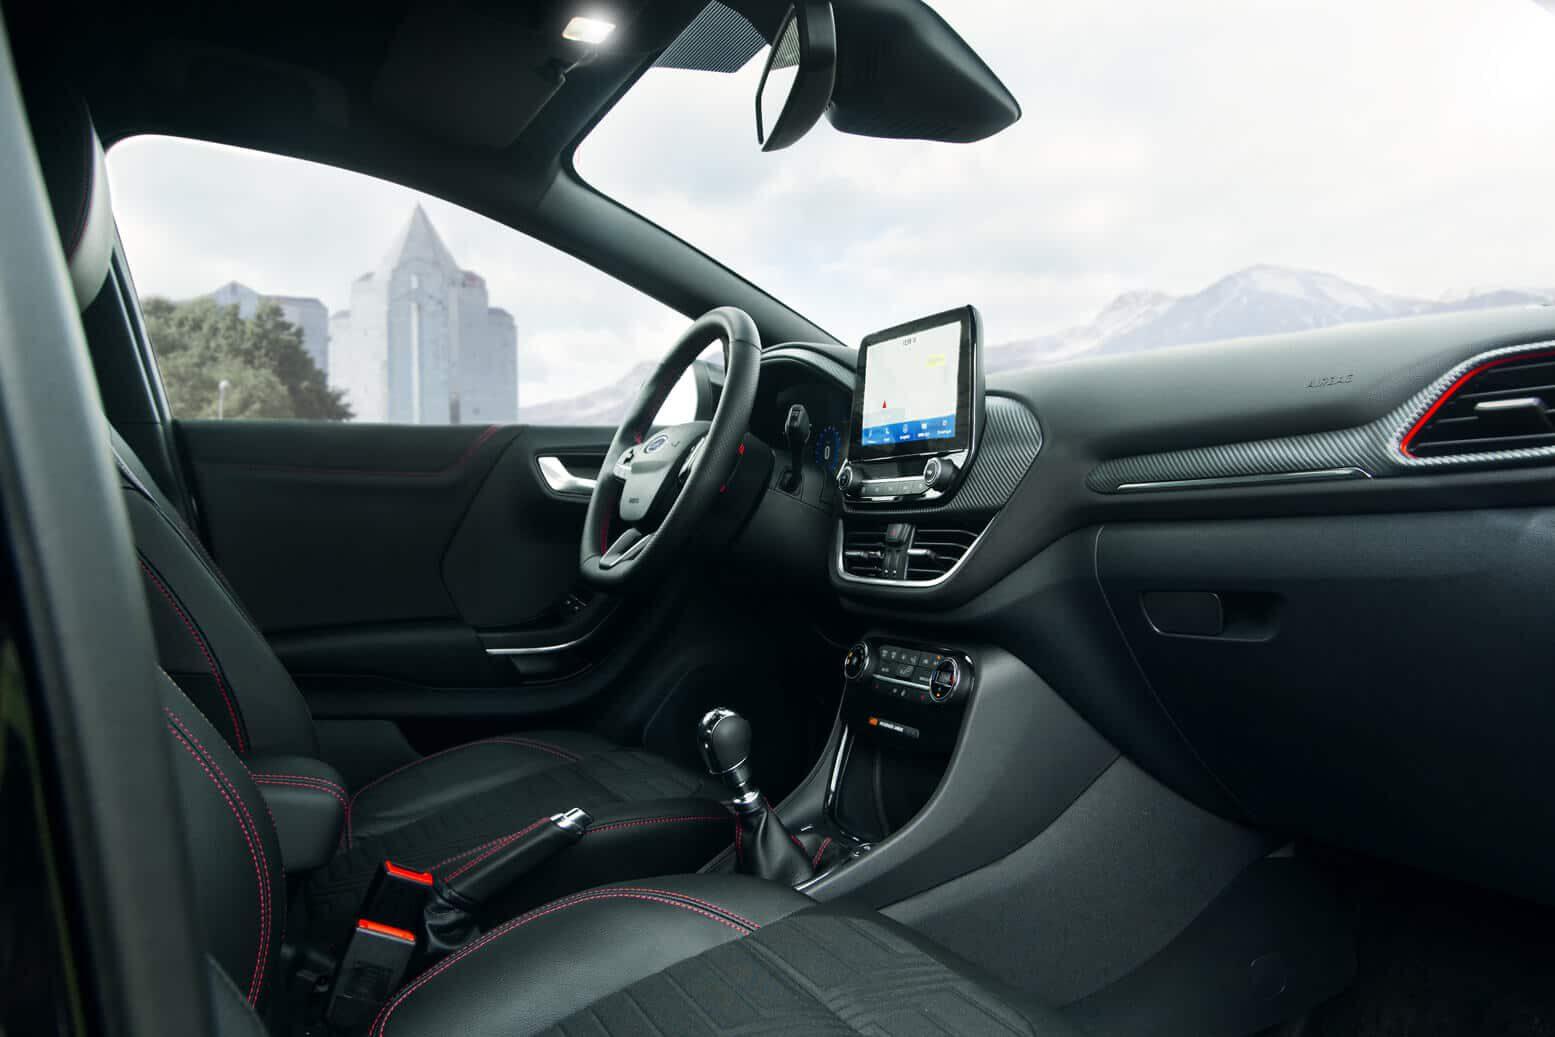 Ford Puma 2020 ST-Line Innenraum Beifahrerseite